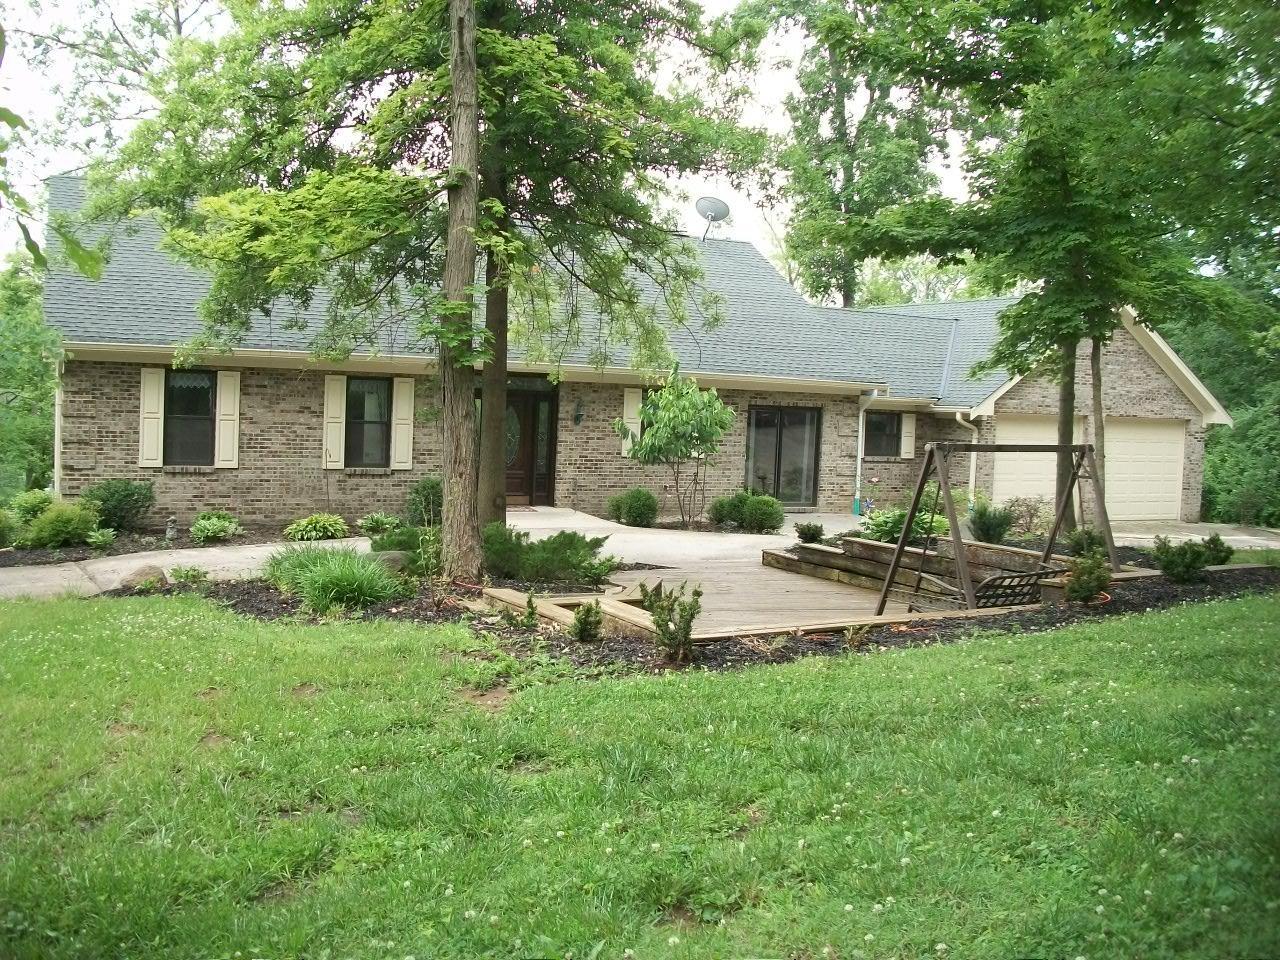 Property for sale at 10298 Deerhollow Drive, Colerain Twp,  Ohio 45252